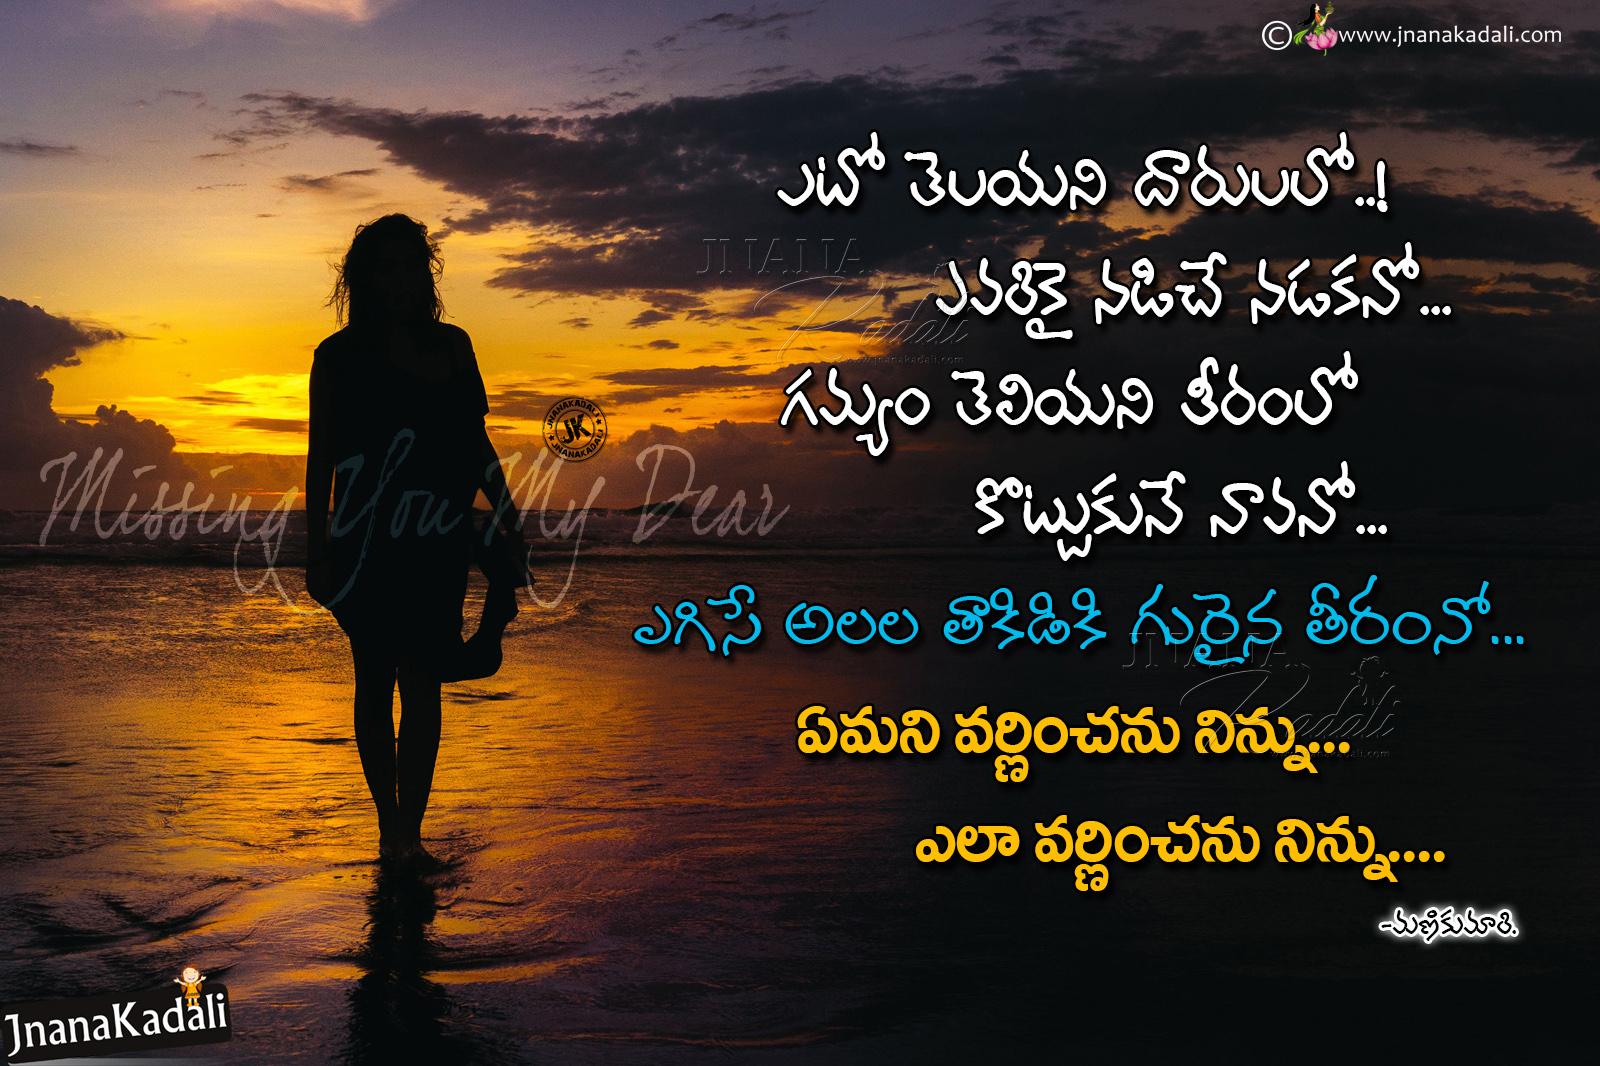 Kannada song WhatsApp status video - YouTube